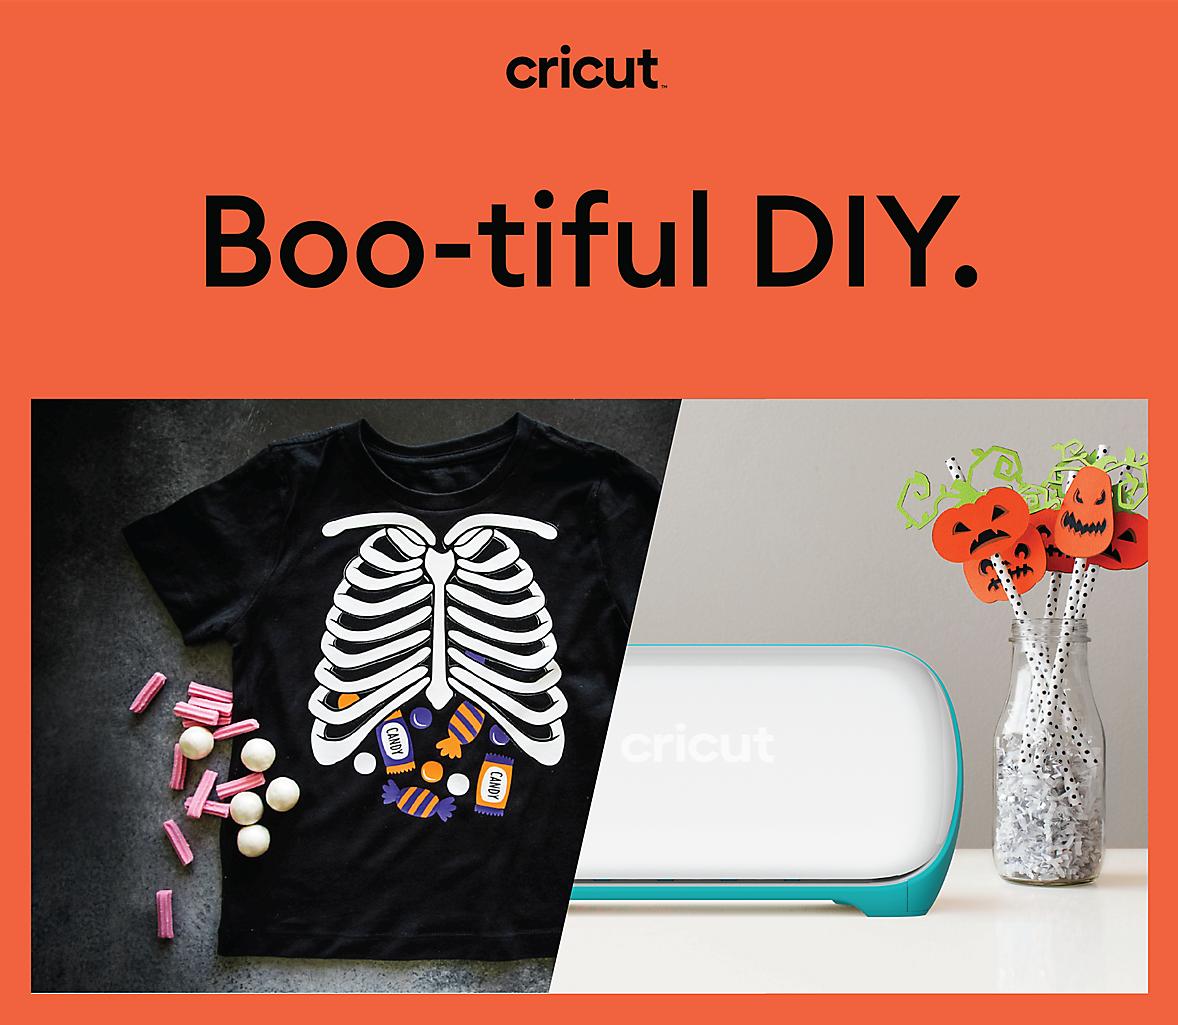 Boo-tiful DIY for Halloween with Cricut